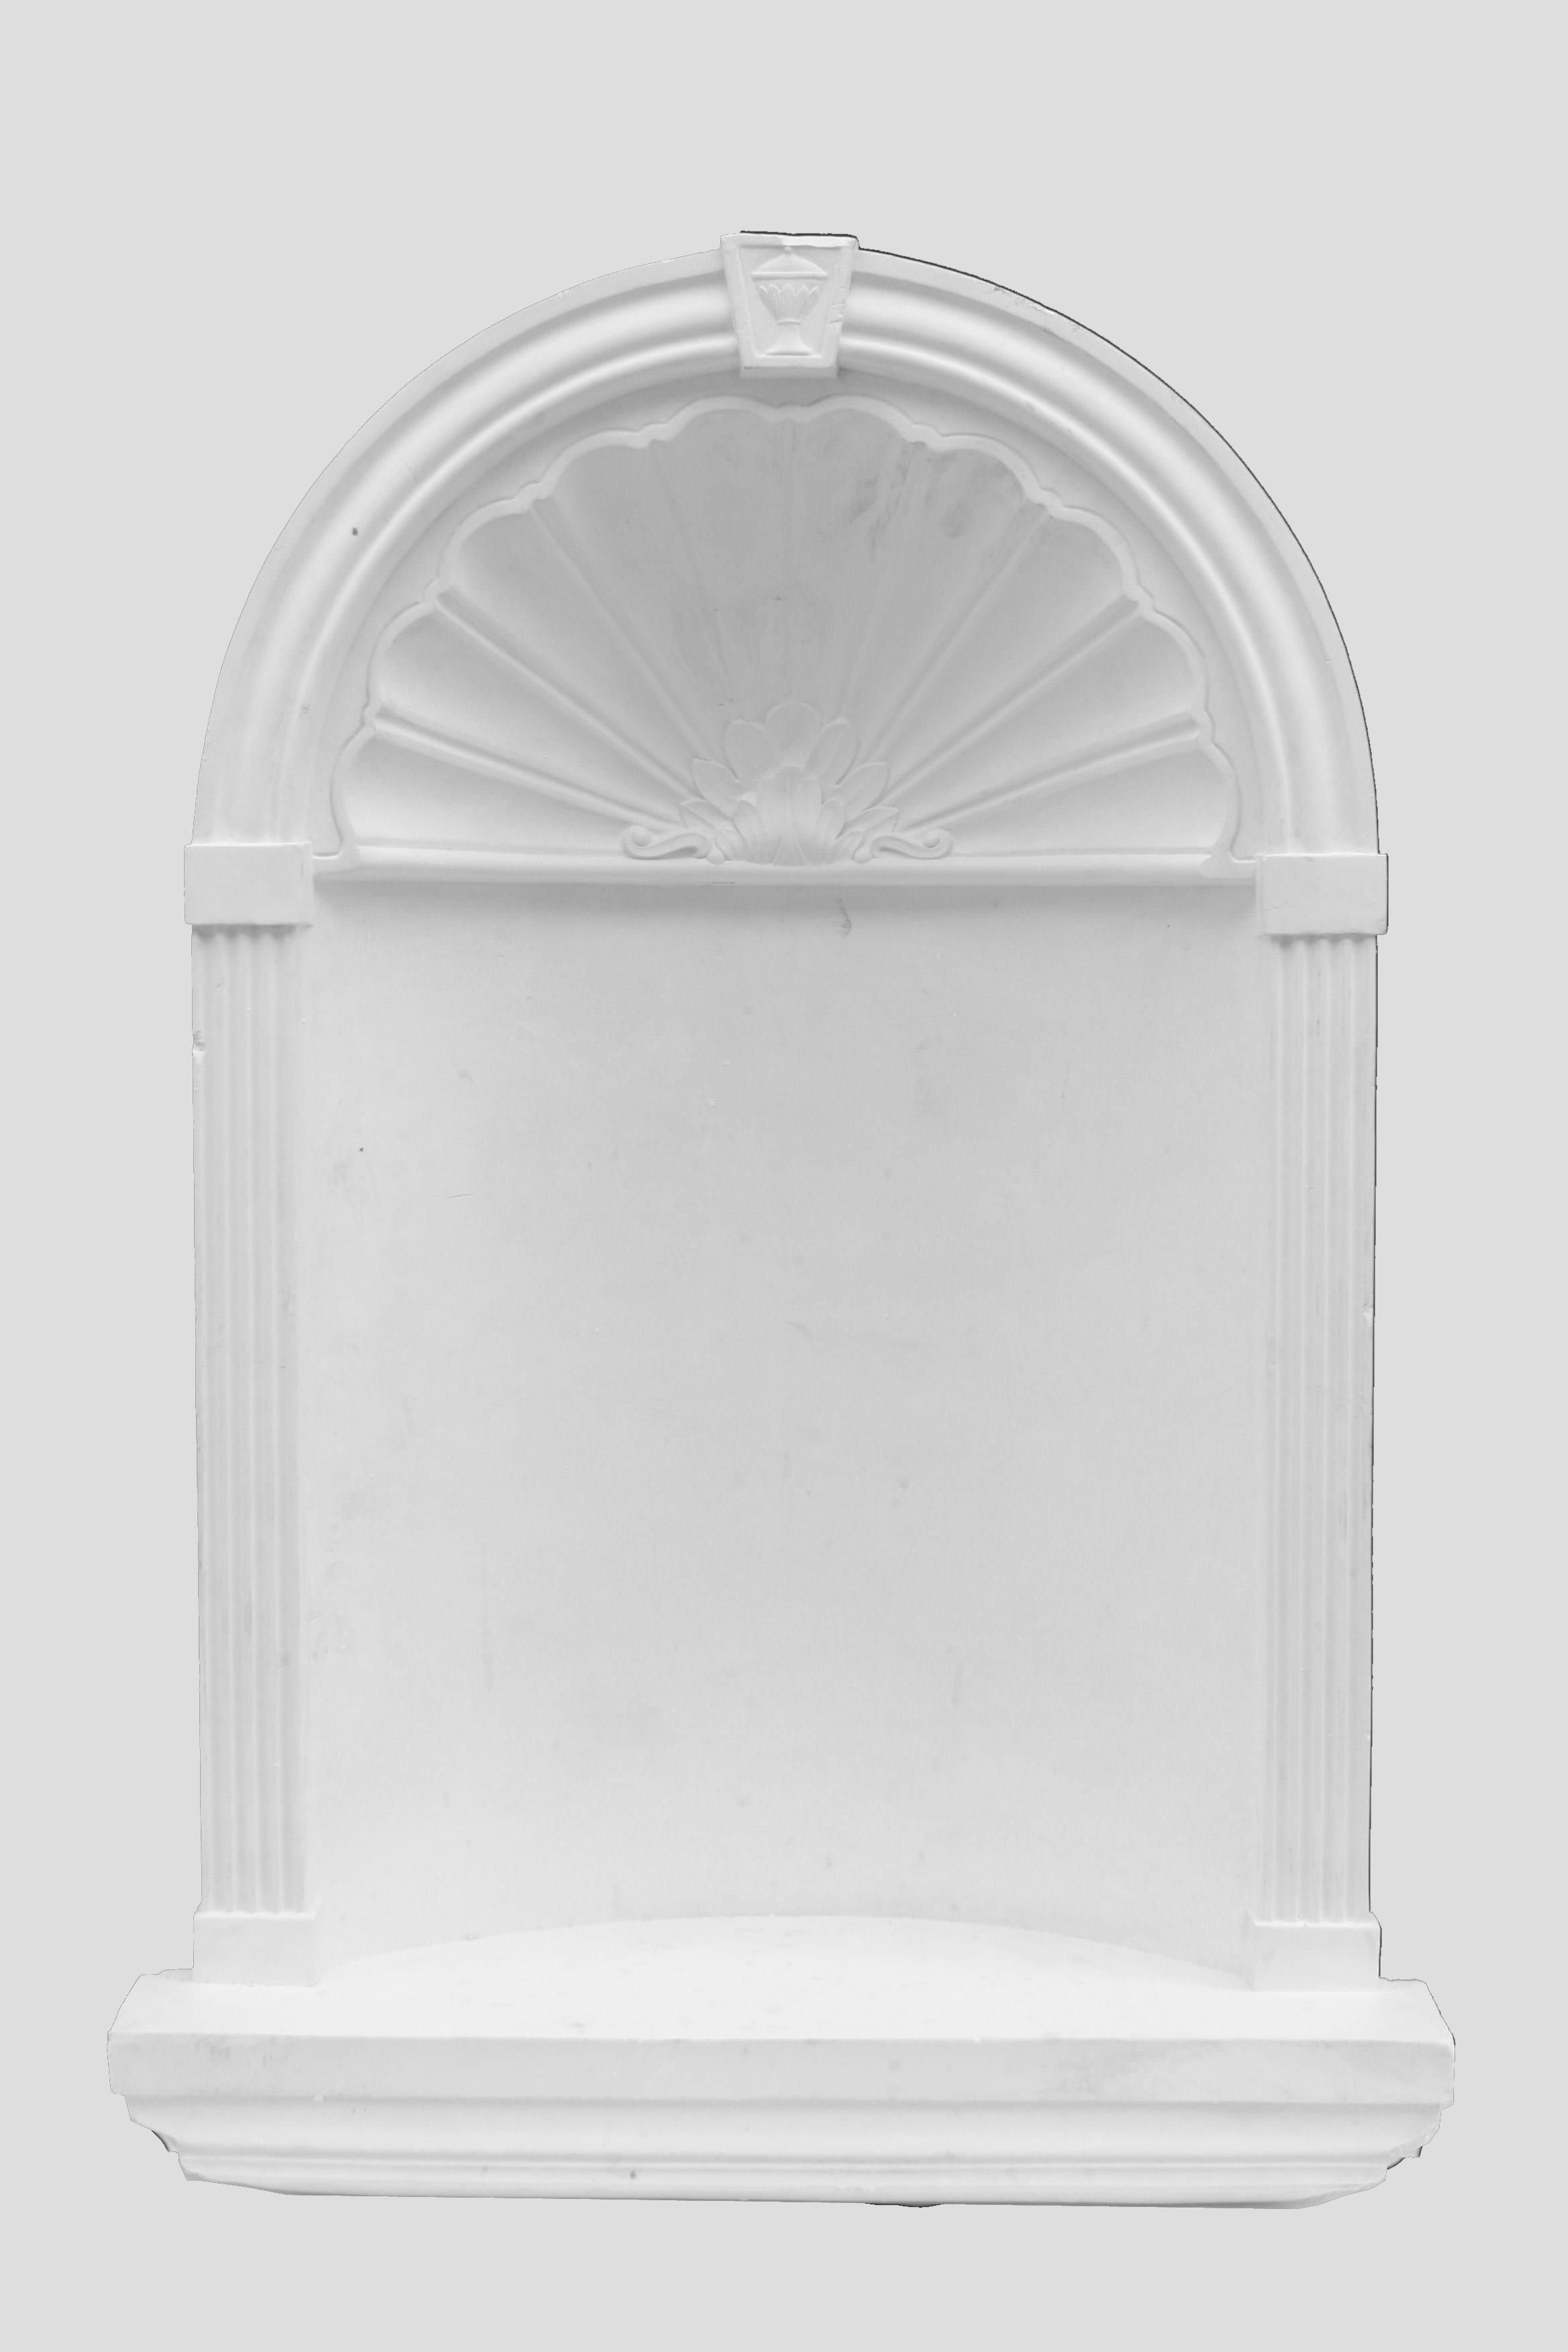 szobrok-szoborfulkek-falfulke-3-kagylos-63_5x94cm